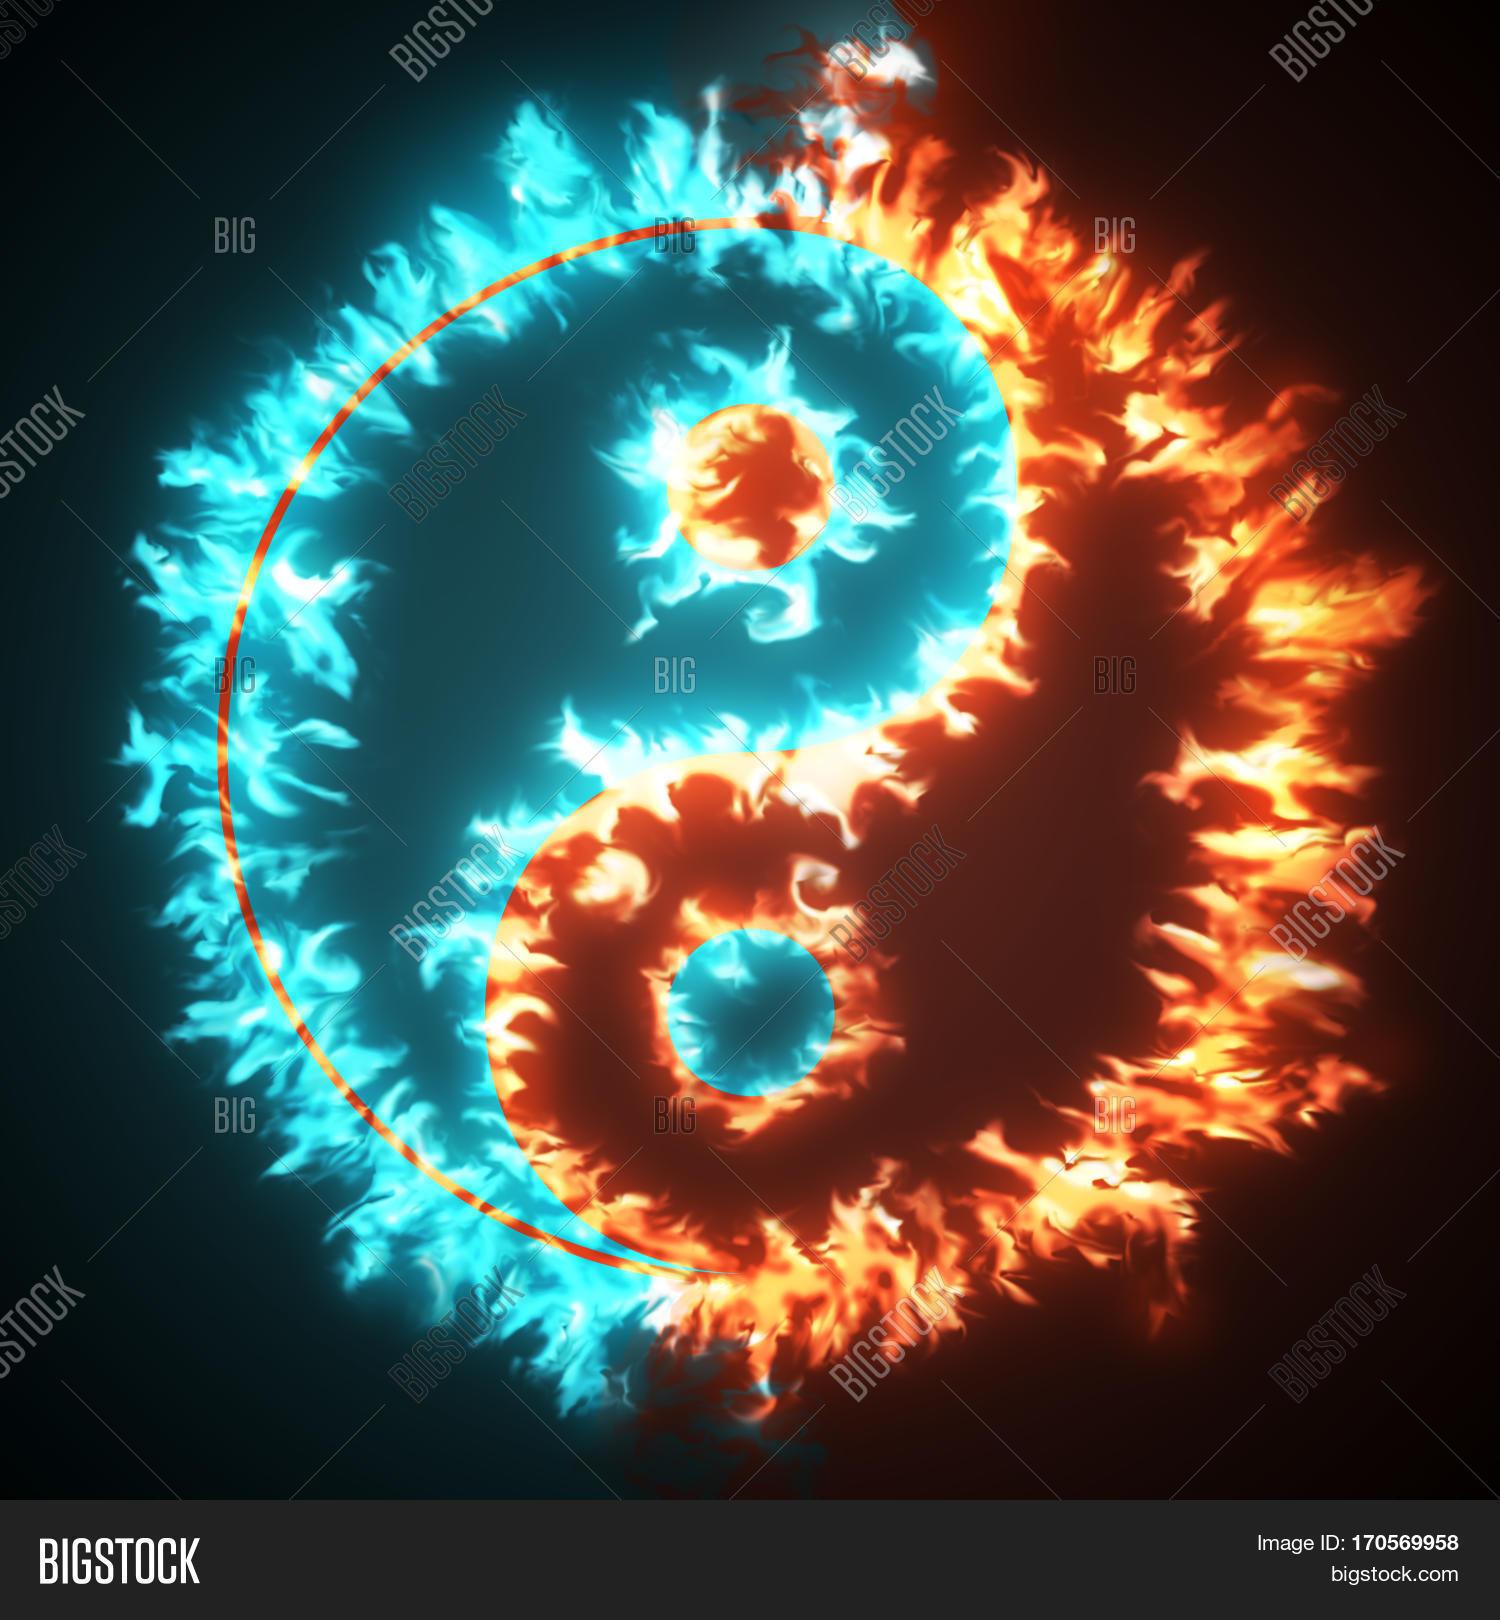 Yin yang symbol red blue fire image photo bigstock yin and yang symbol in red and blue fire concepts of the bad inside buycottarizona